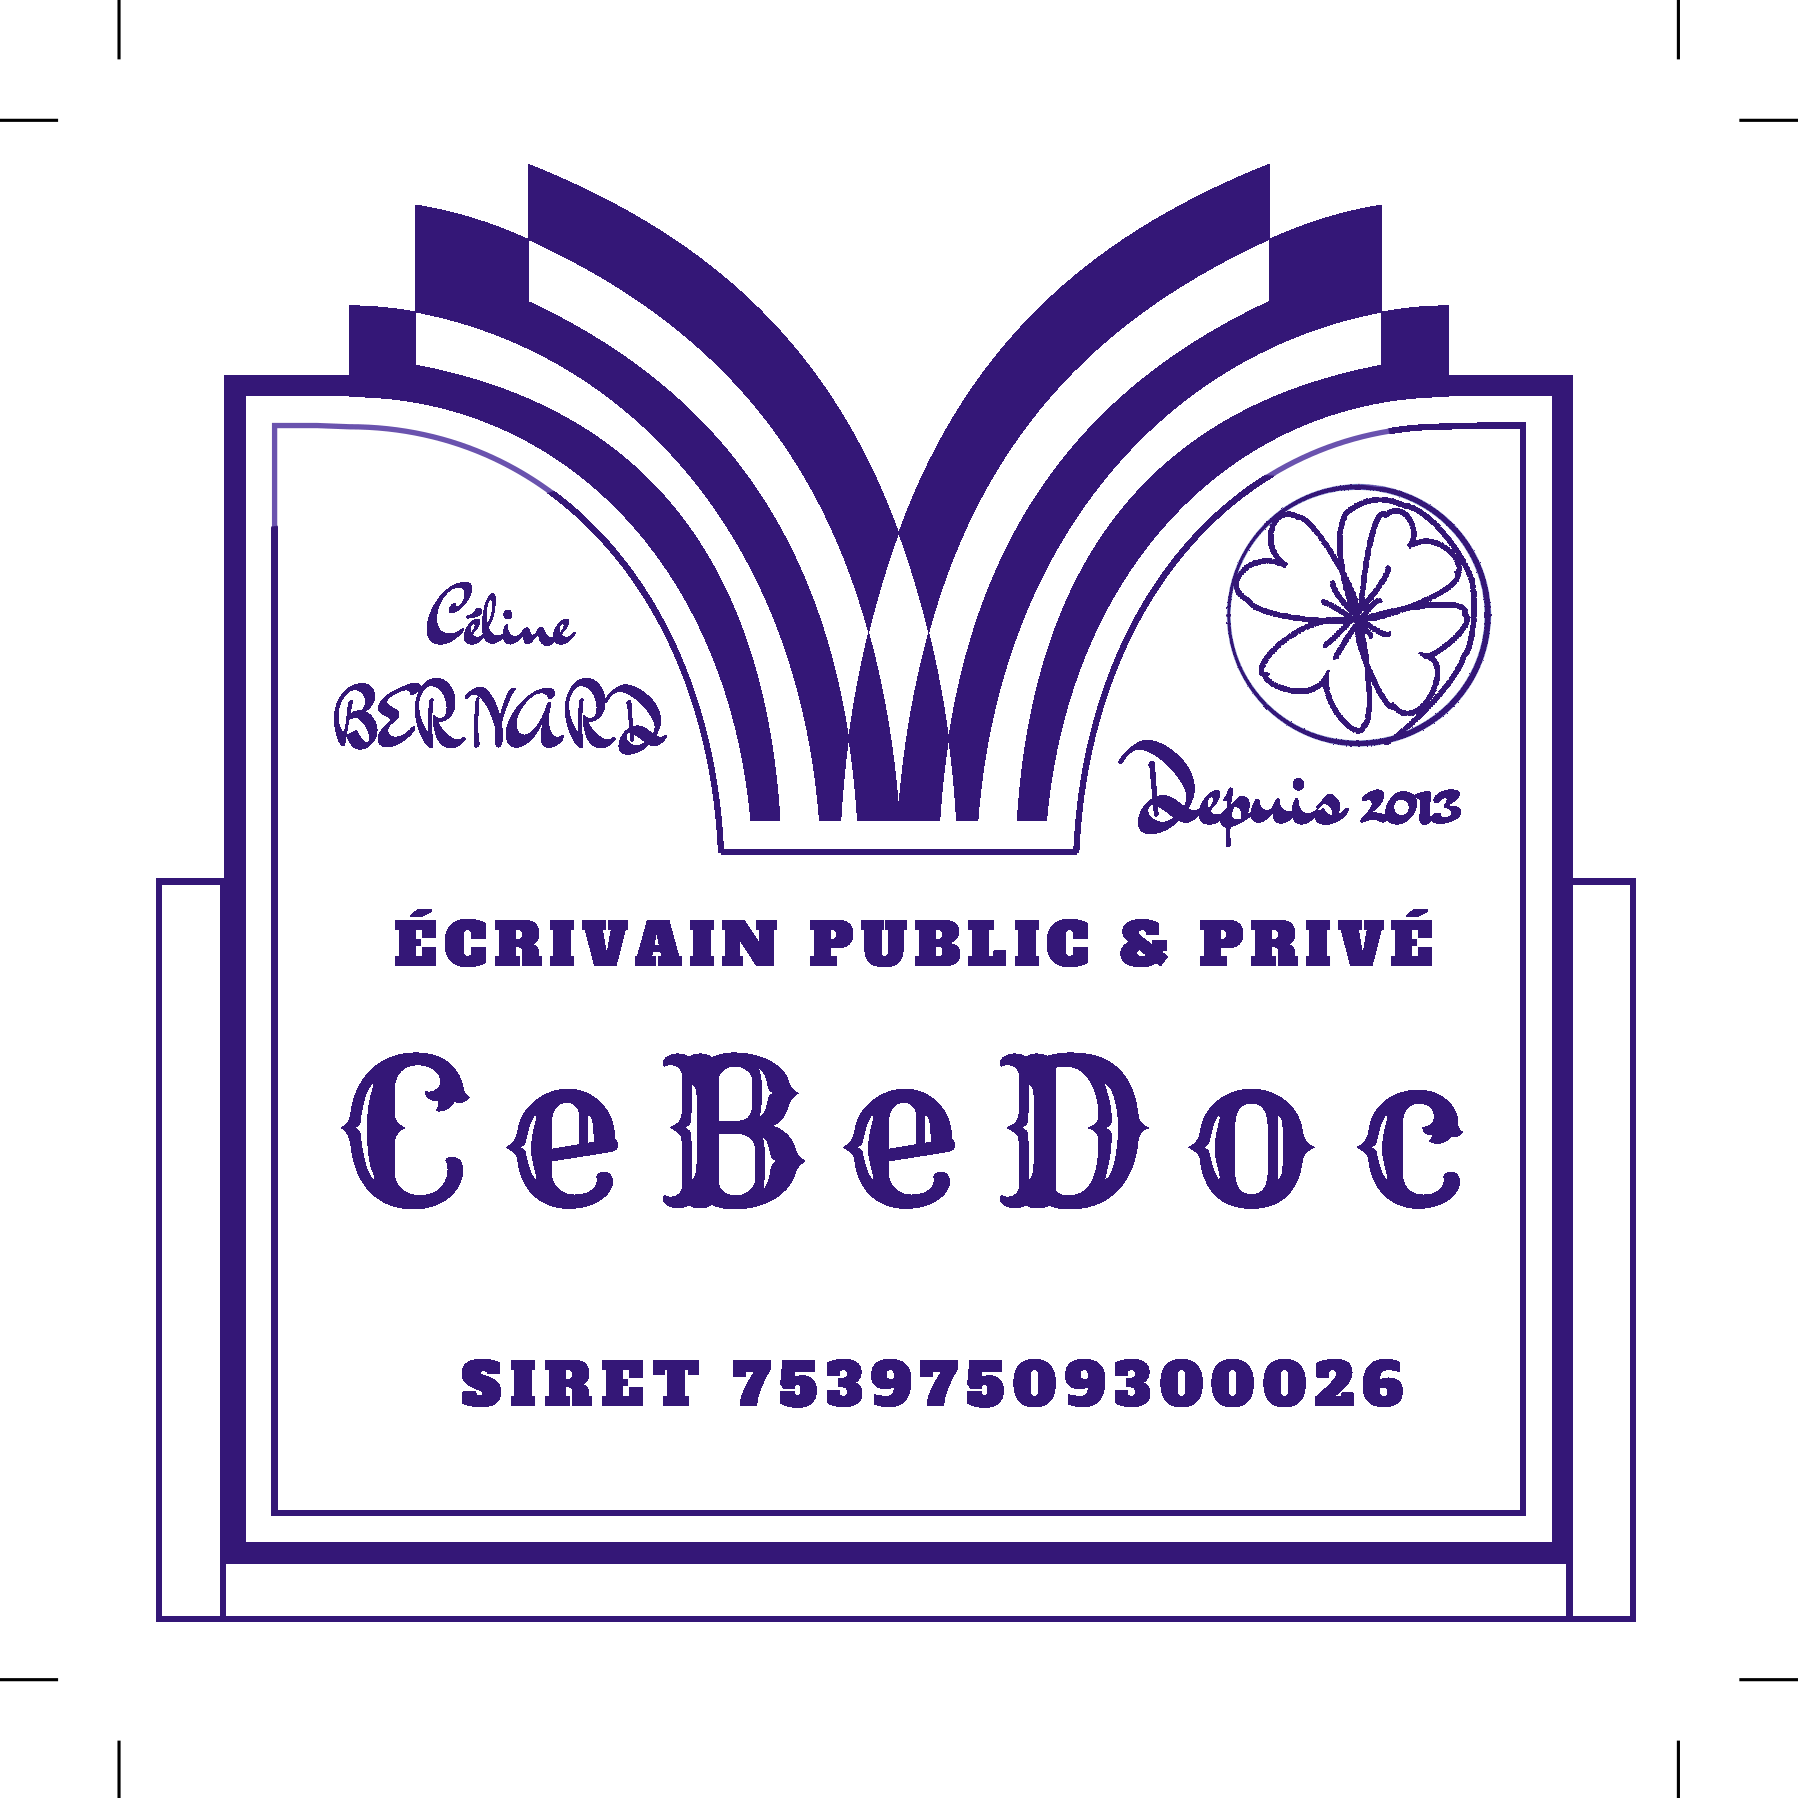 log -Cebedoc